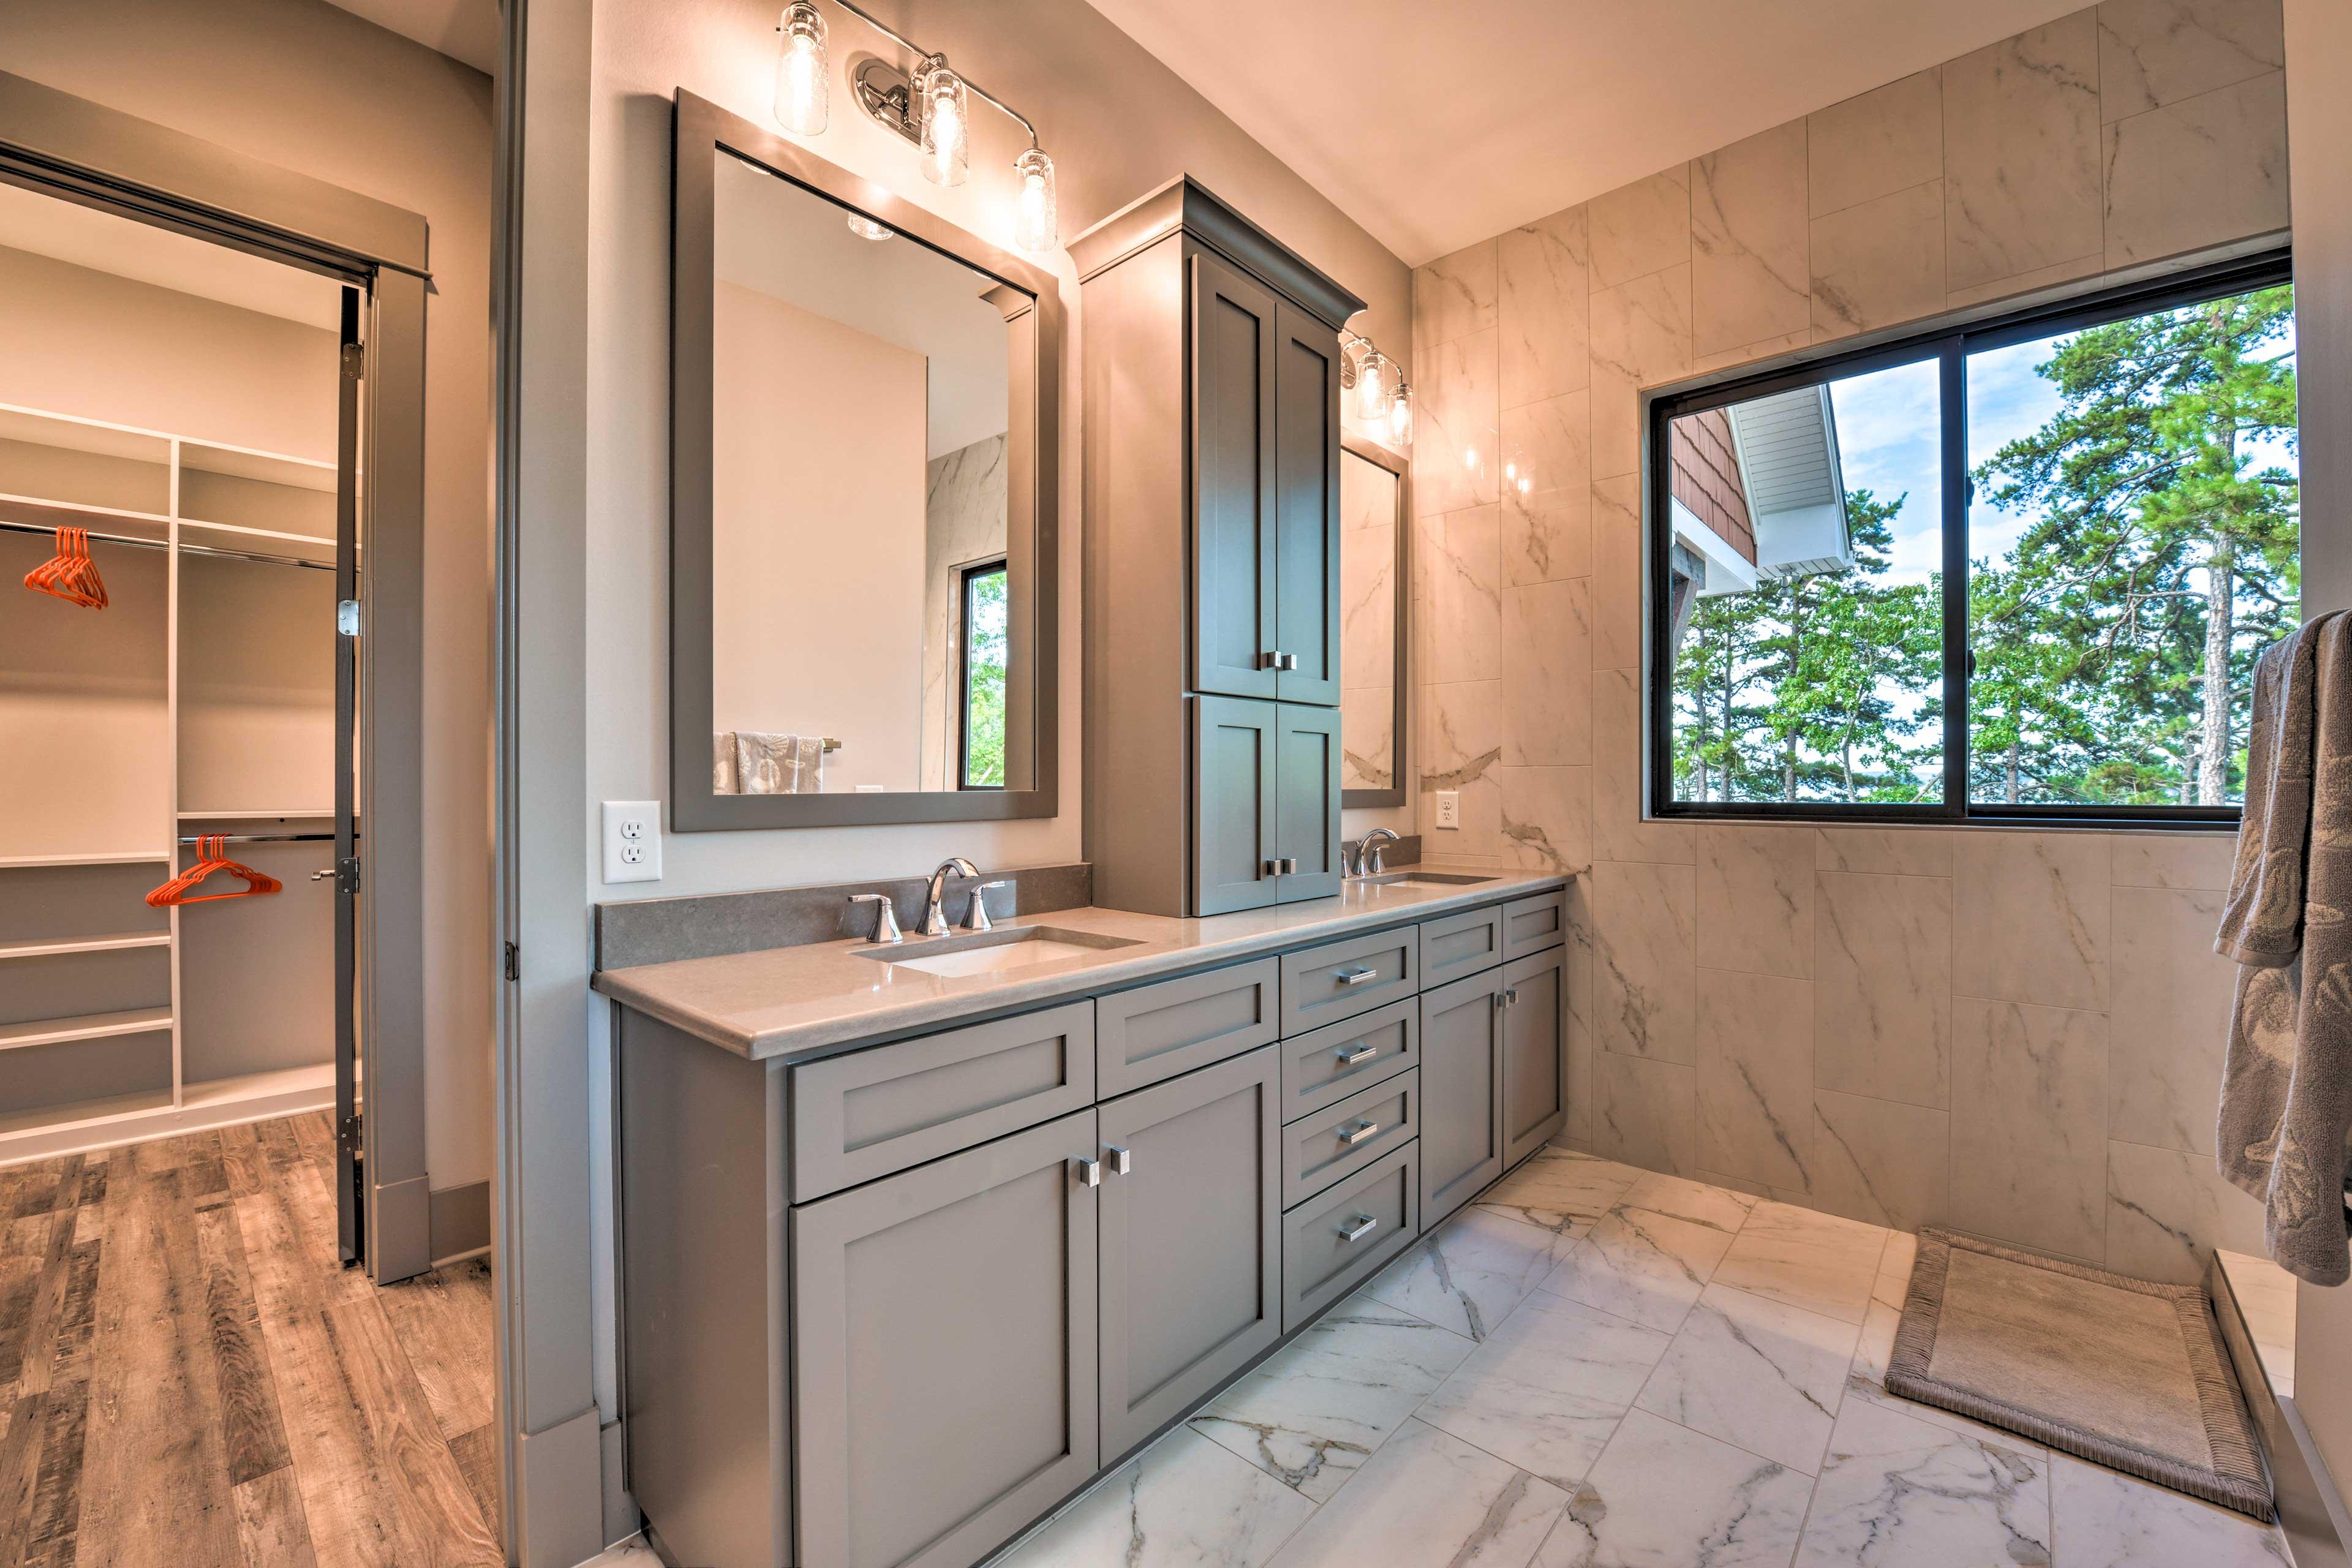 Enjoy the gorgeous en-suite bath with double vanities and a large closet.